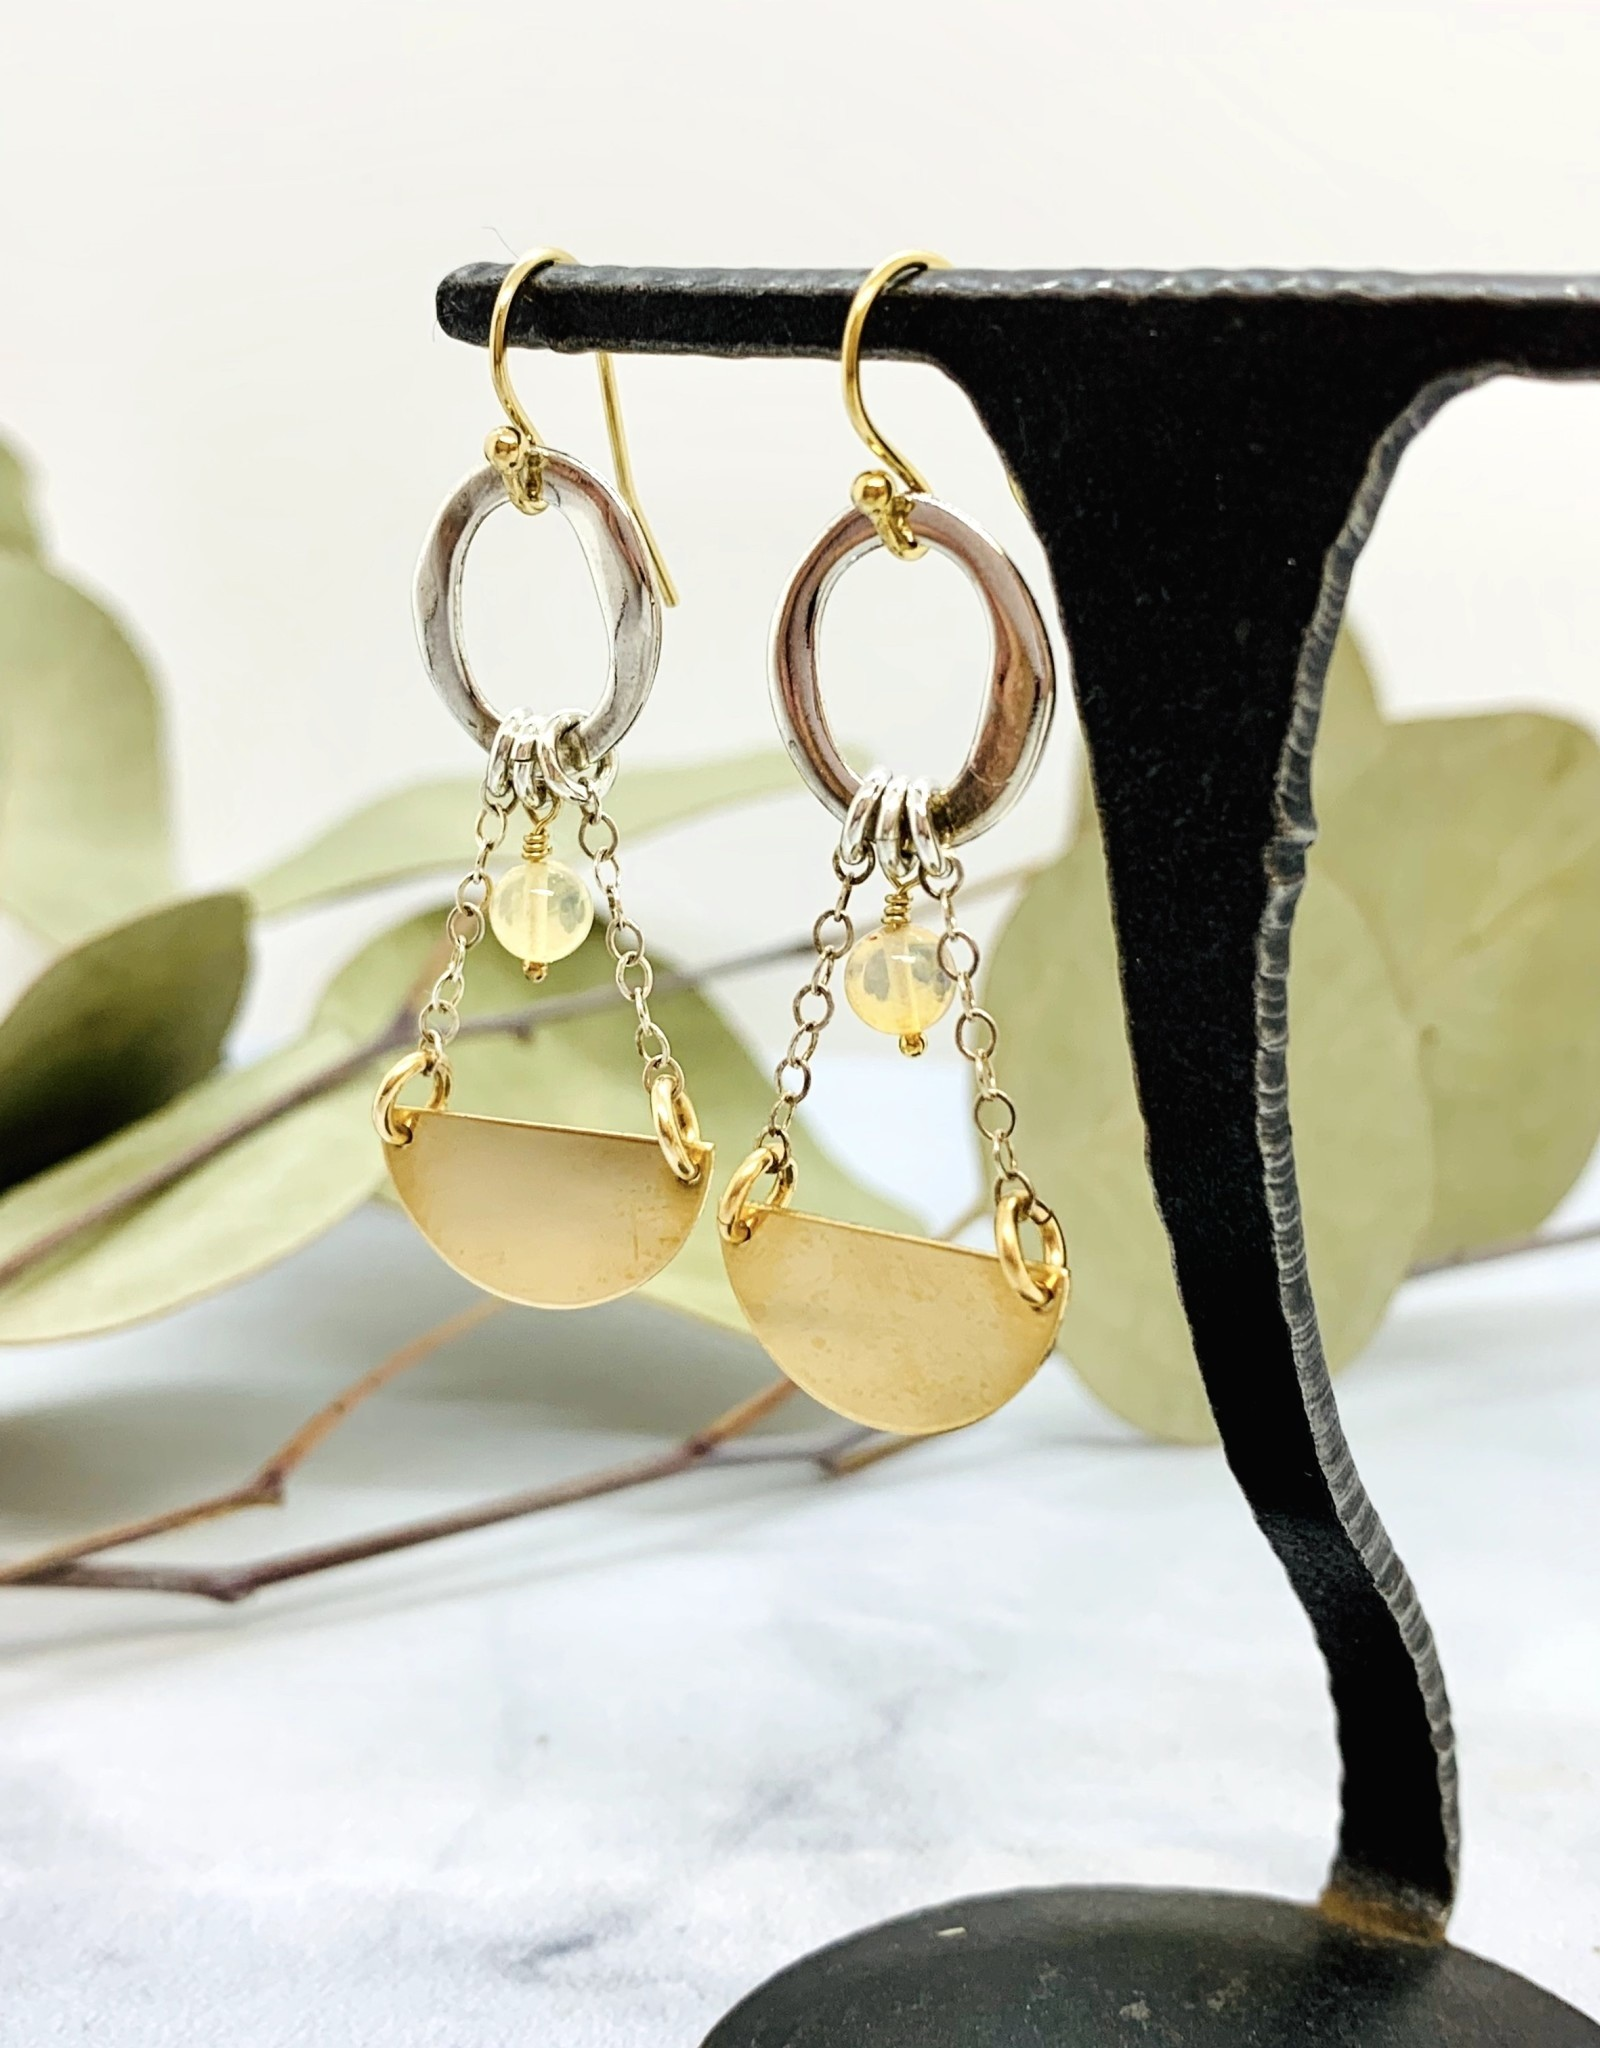 EVANKNOX Handmade Sterling Silver Earrings with opal ball, shiny organic circle, 14 k g.f. 1/2 circle